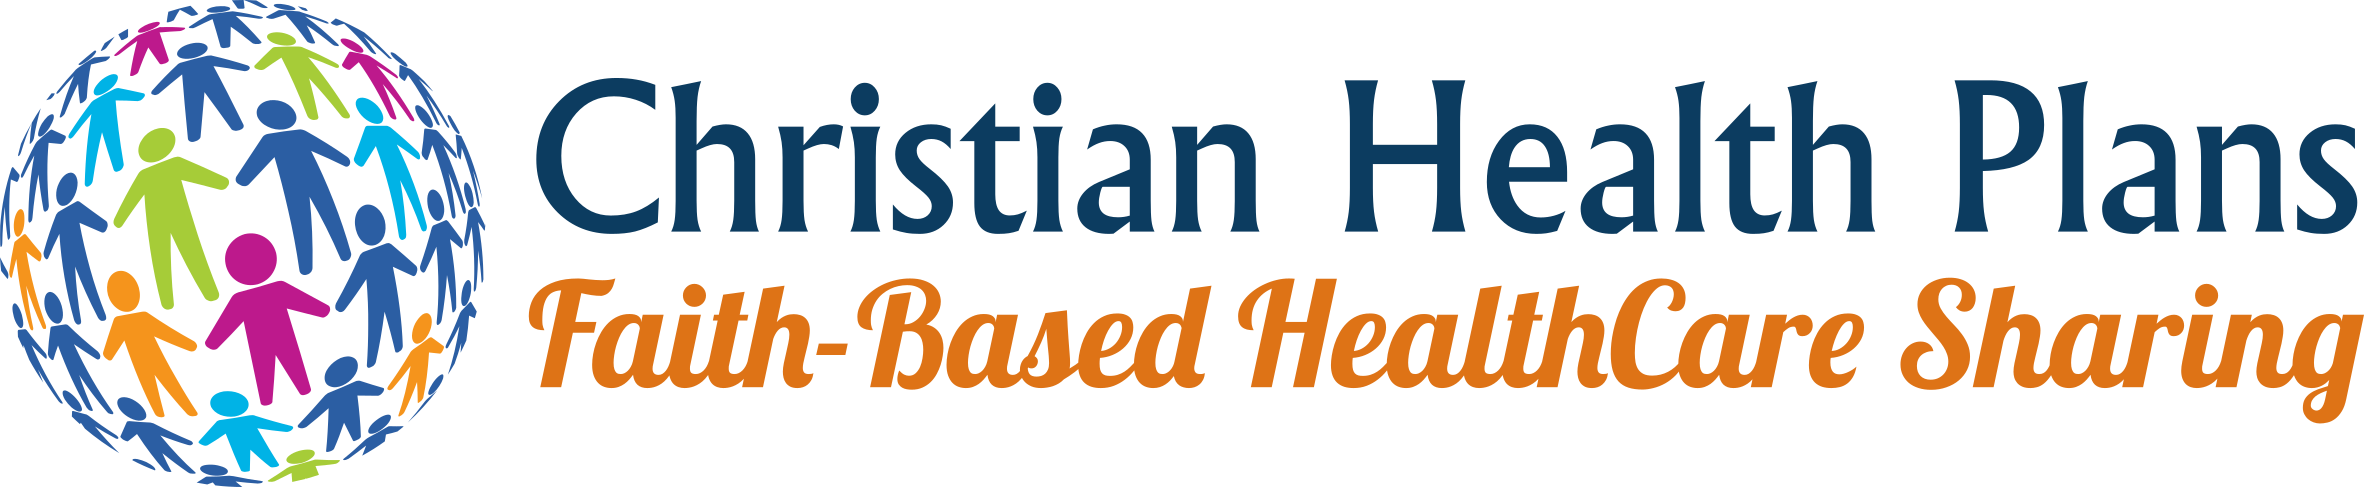 Christian Health Plans